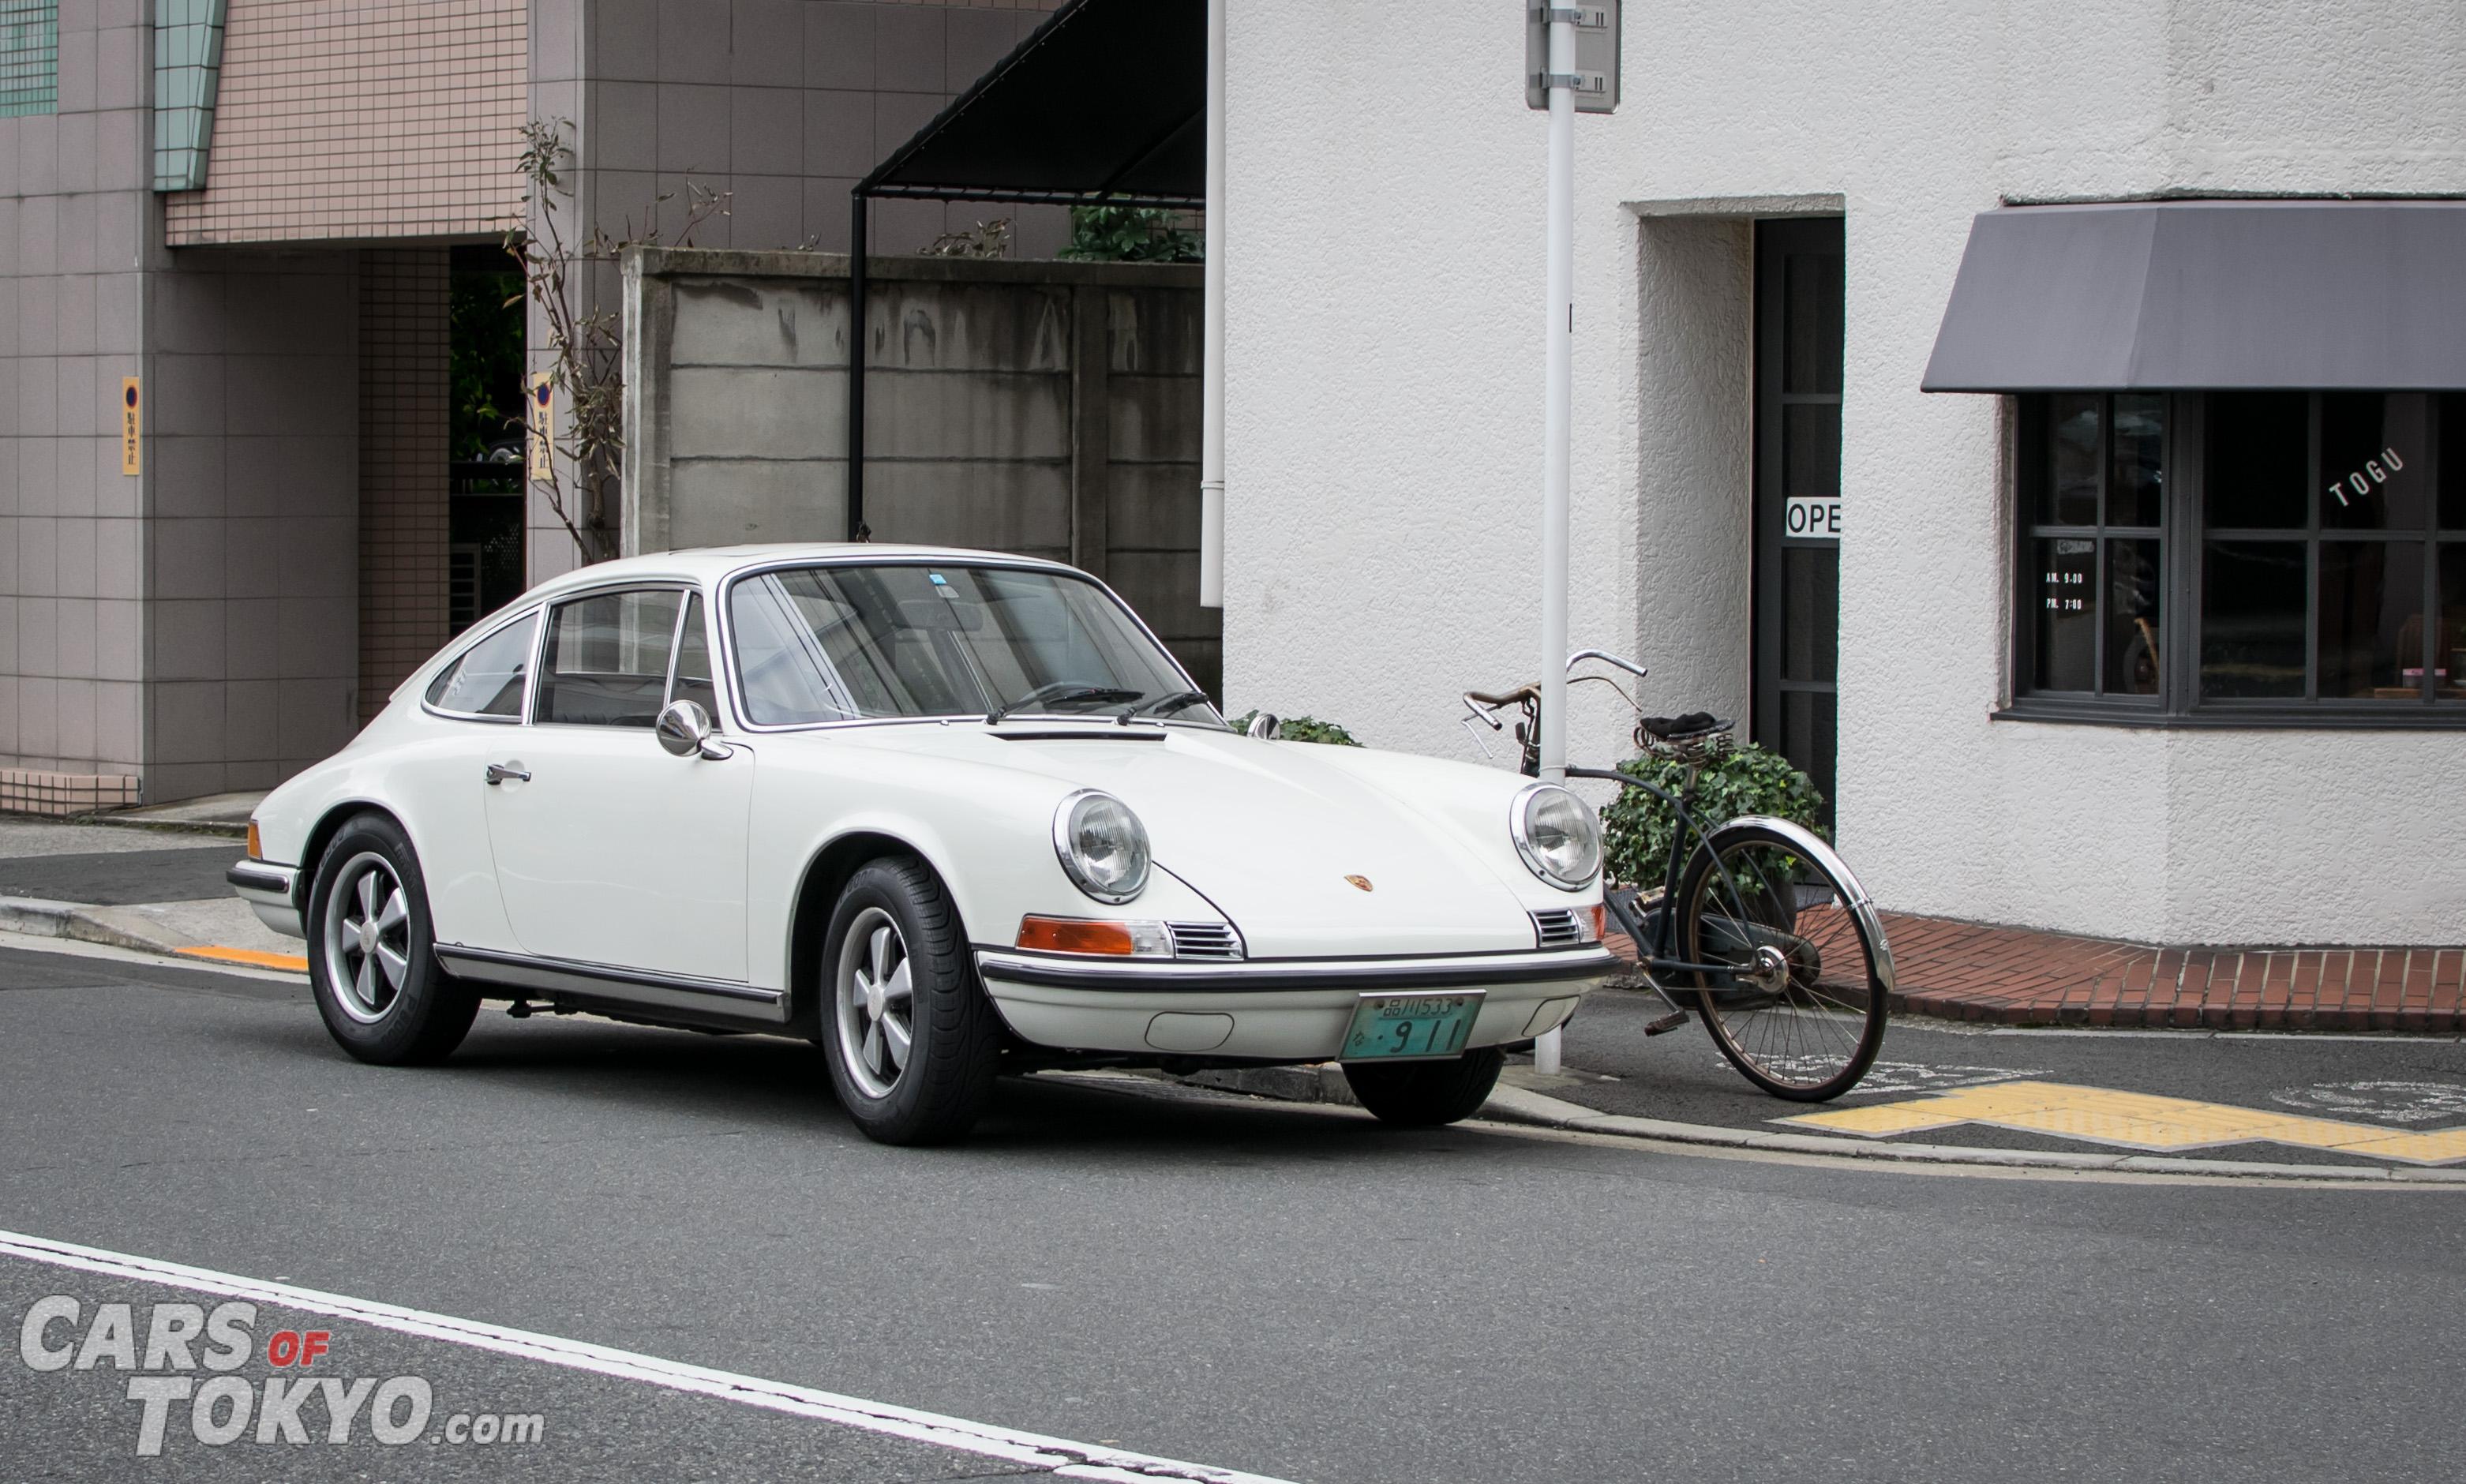 Cars of Tokyo Porsche 911 Classic